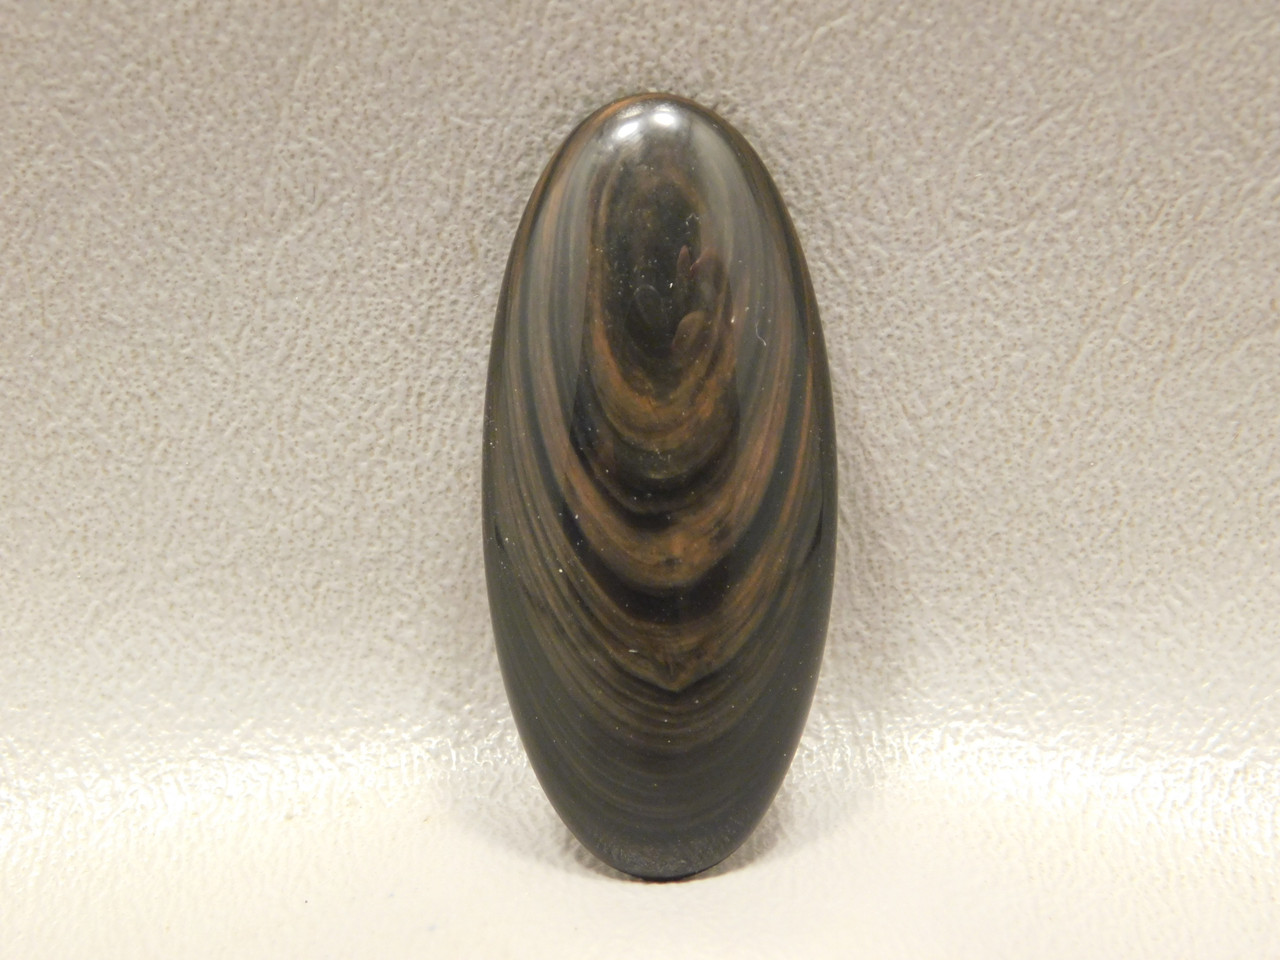 Mahogany Obsidian Cabochon Gold Sheen Oregon Gemstone #15